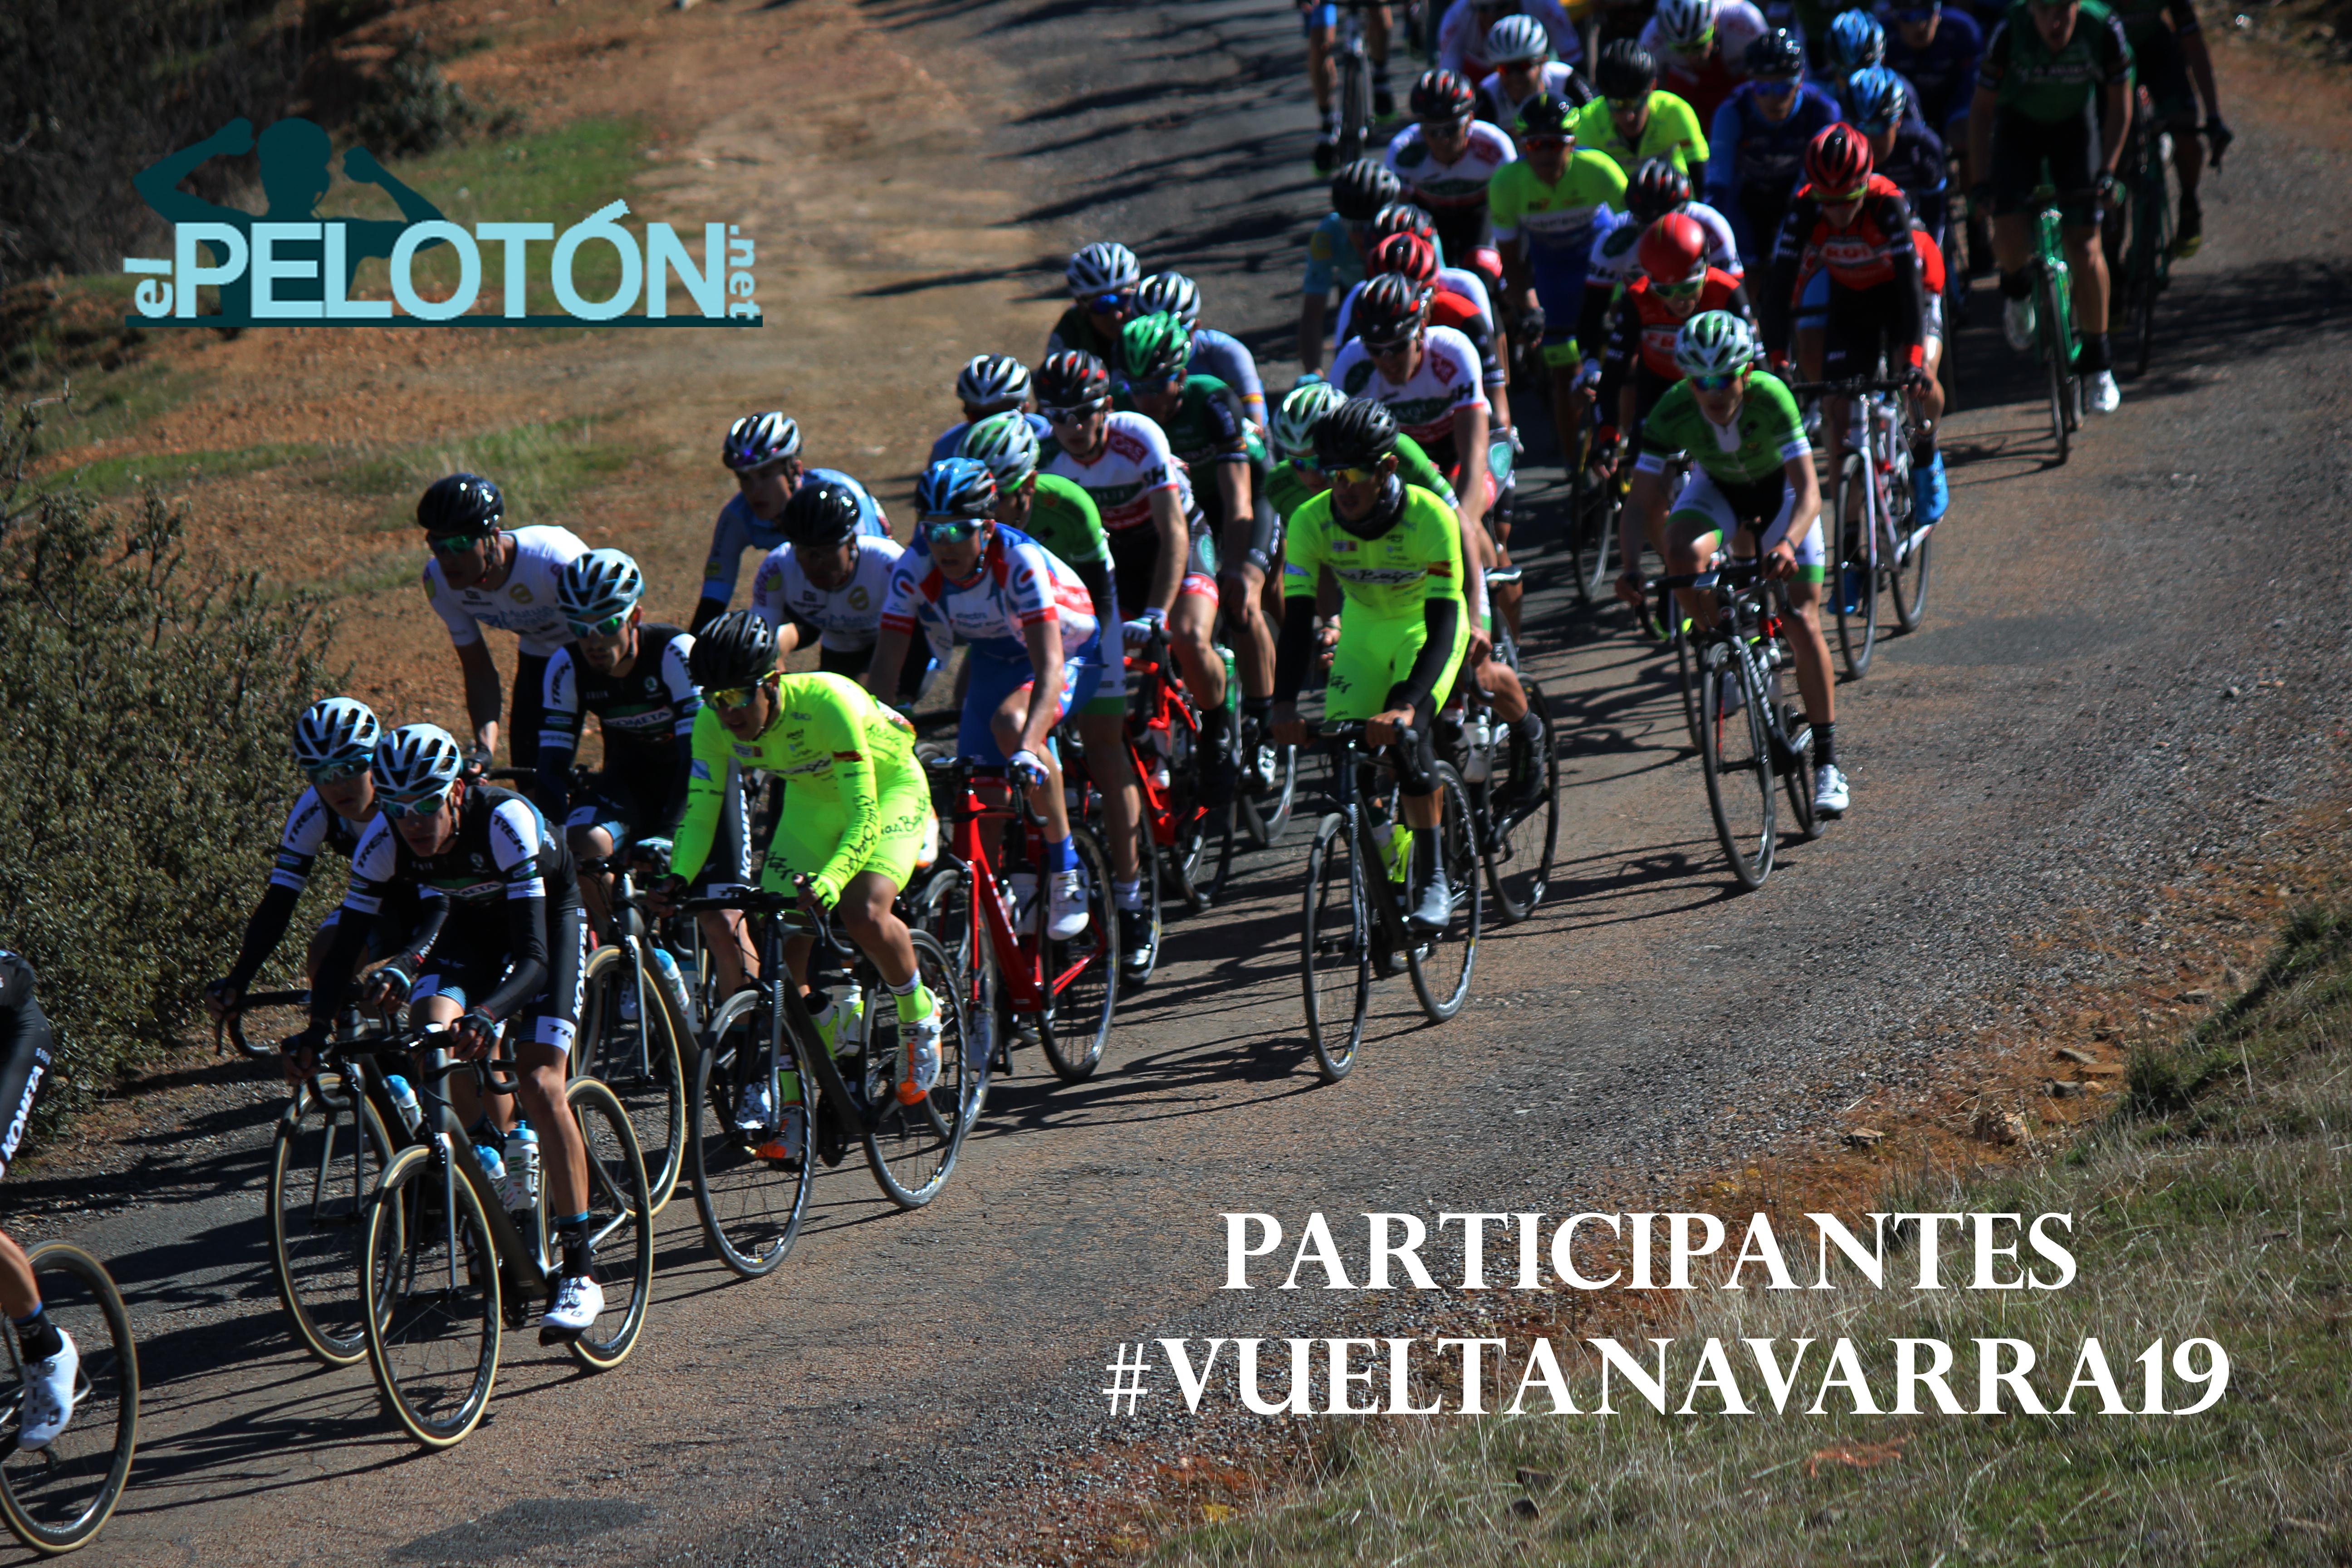 Participantes Vuelta Navarra